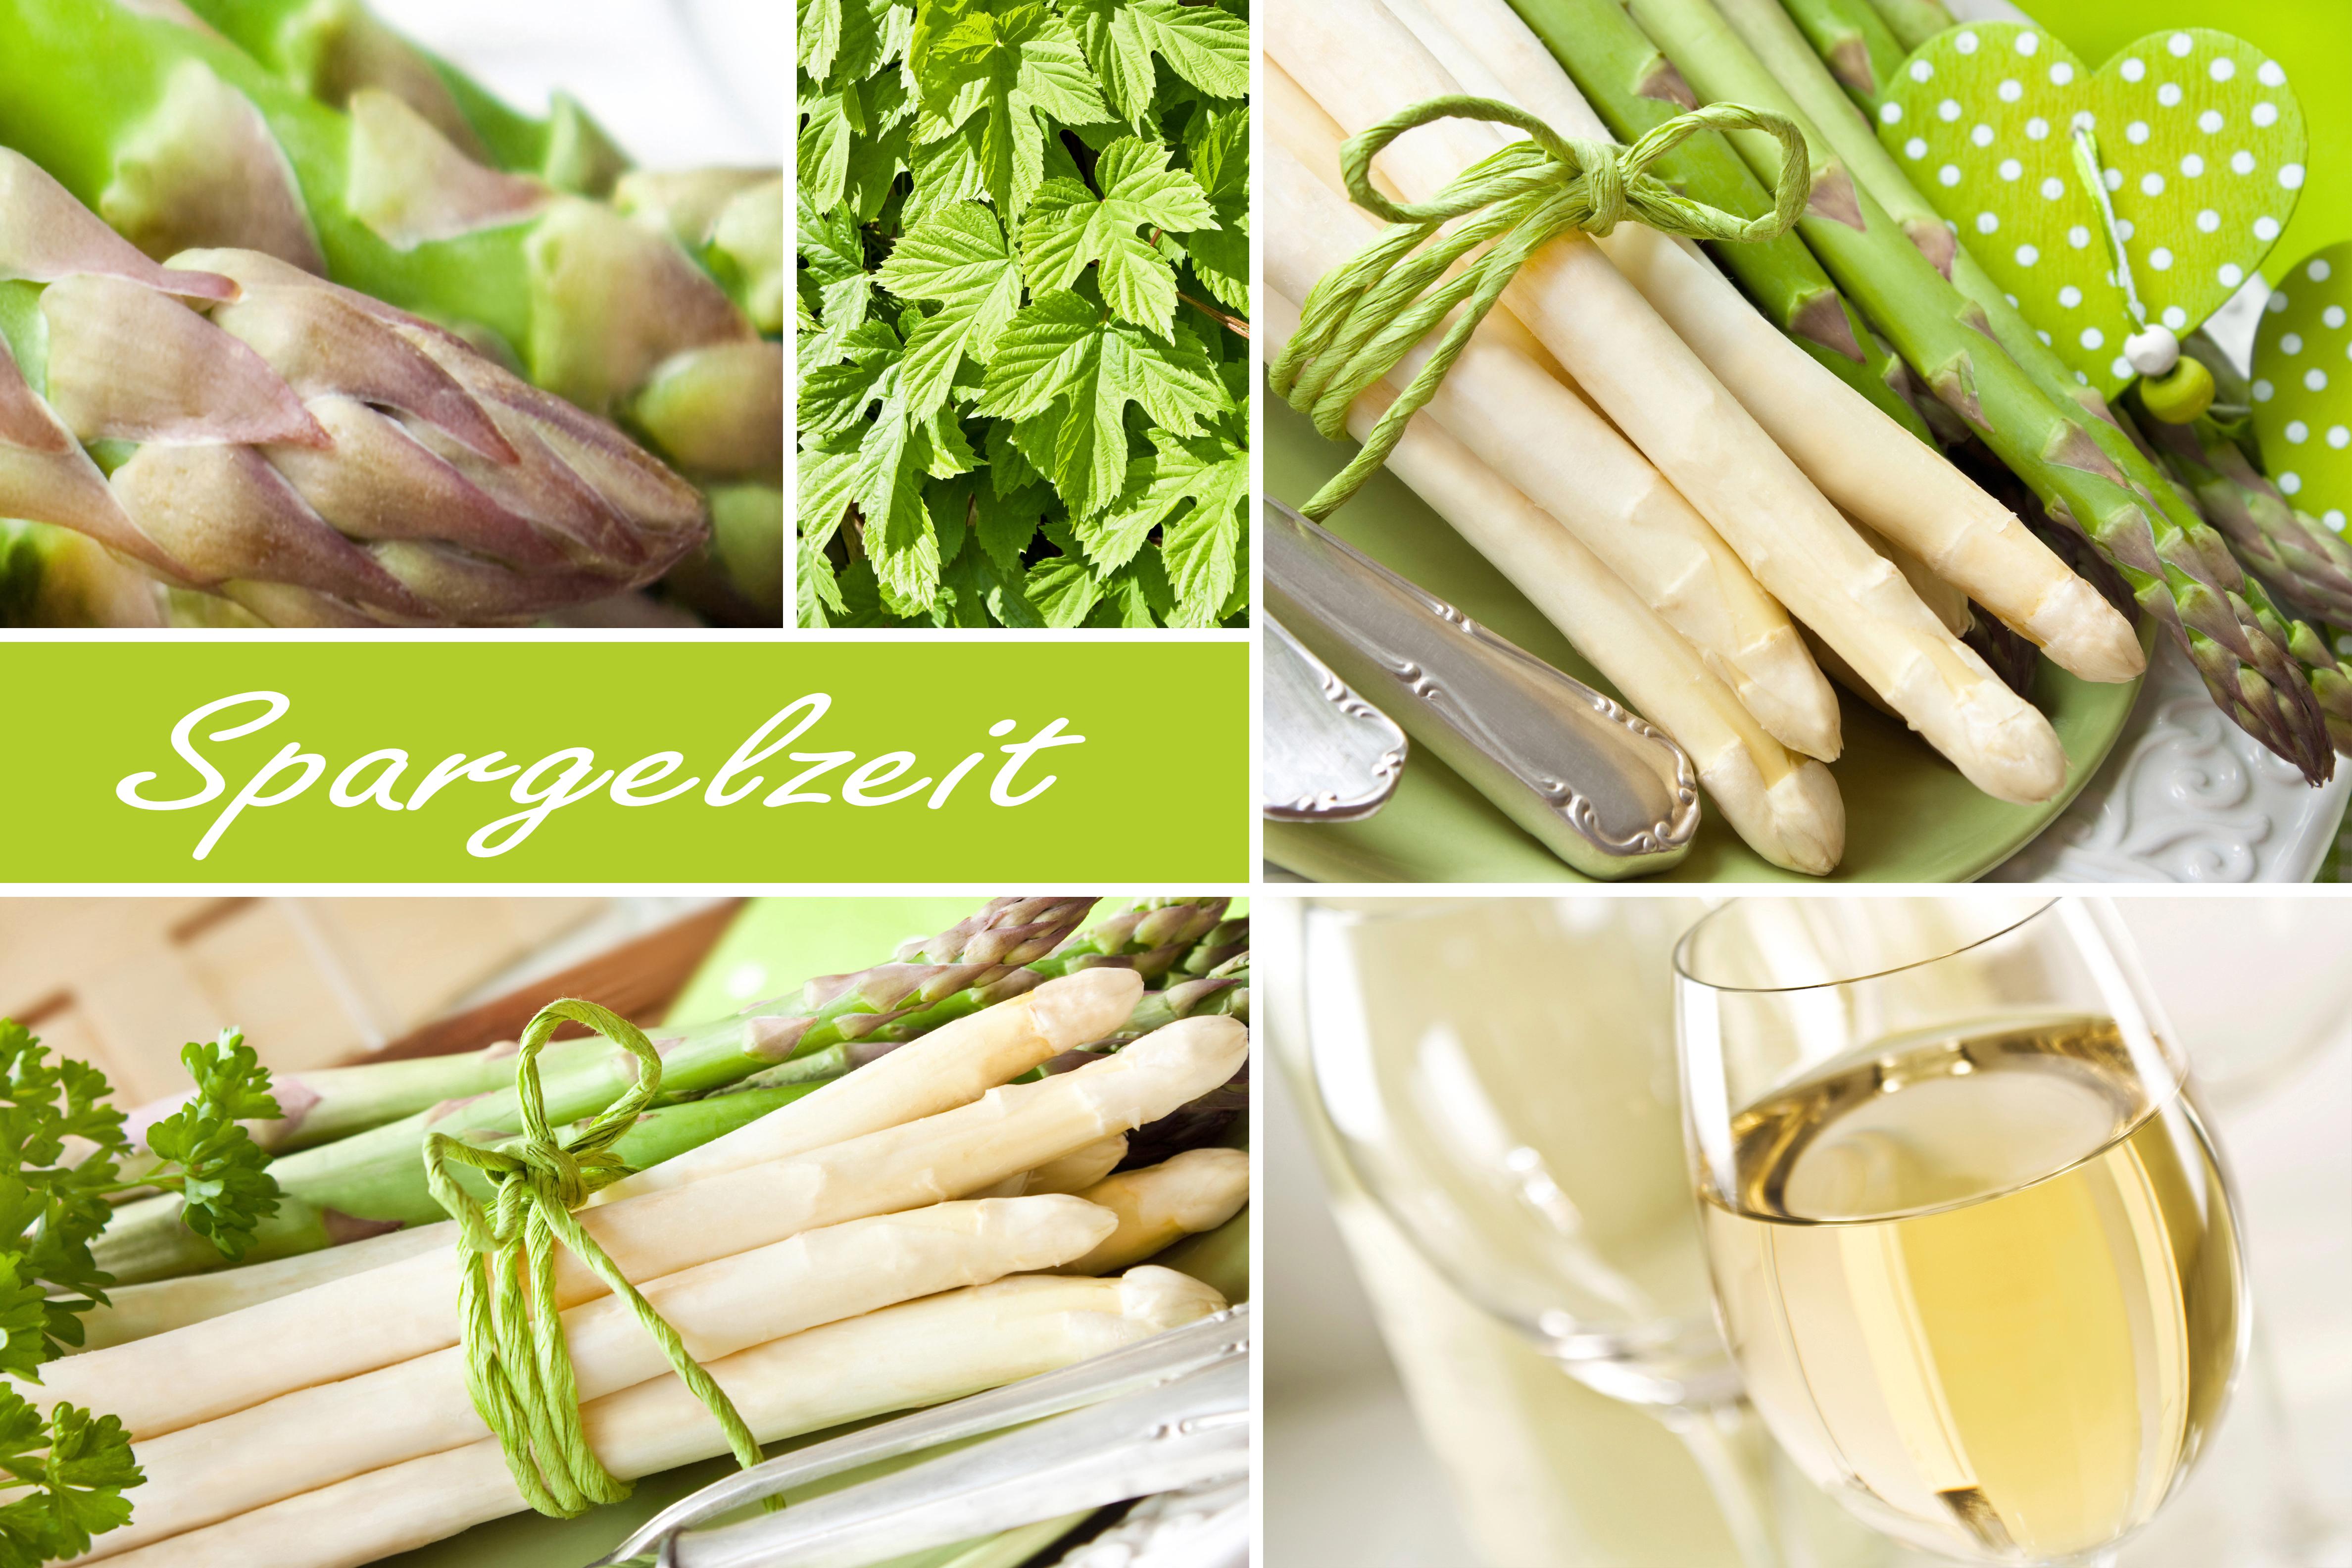 Asparagus Season collage